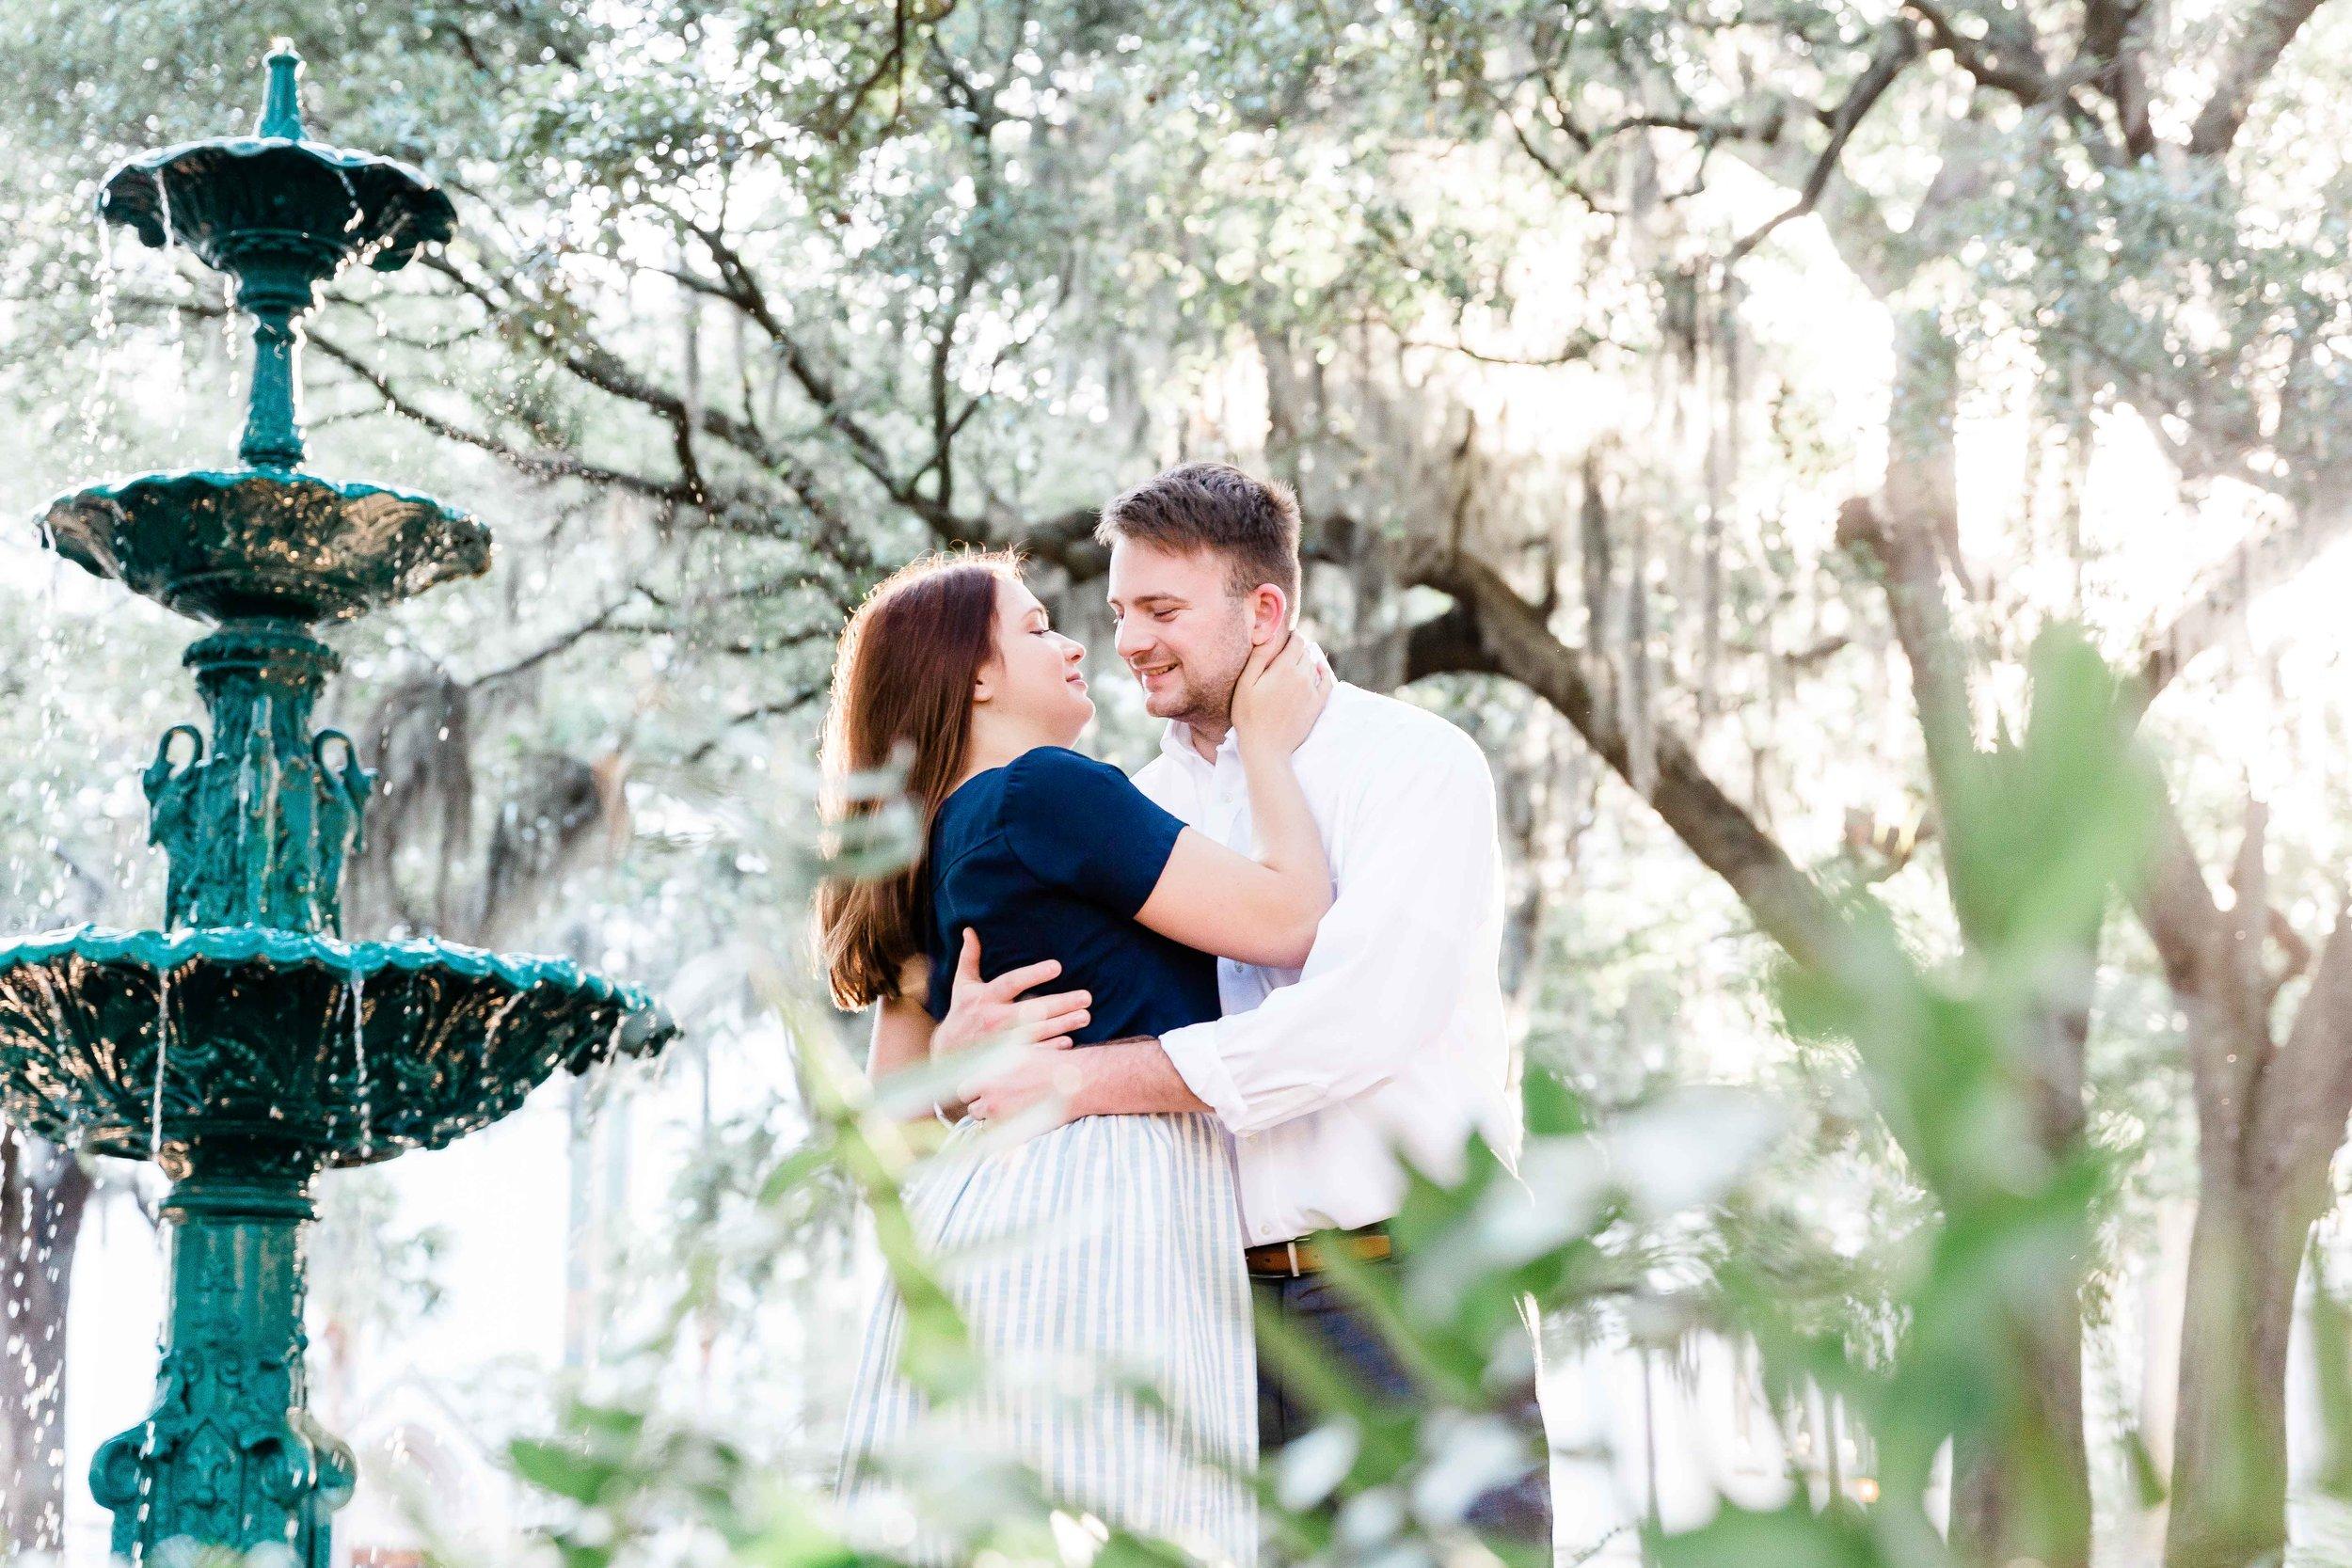 20190519Georgia-Savannah-Kristen & Zach-Forsyth Park-Lafayette Square24.jpg